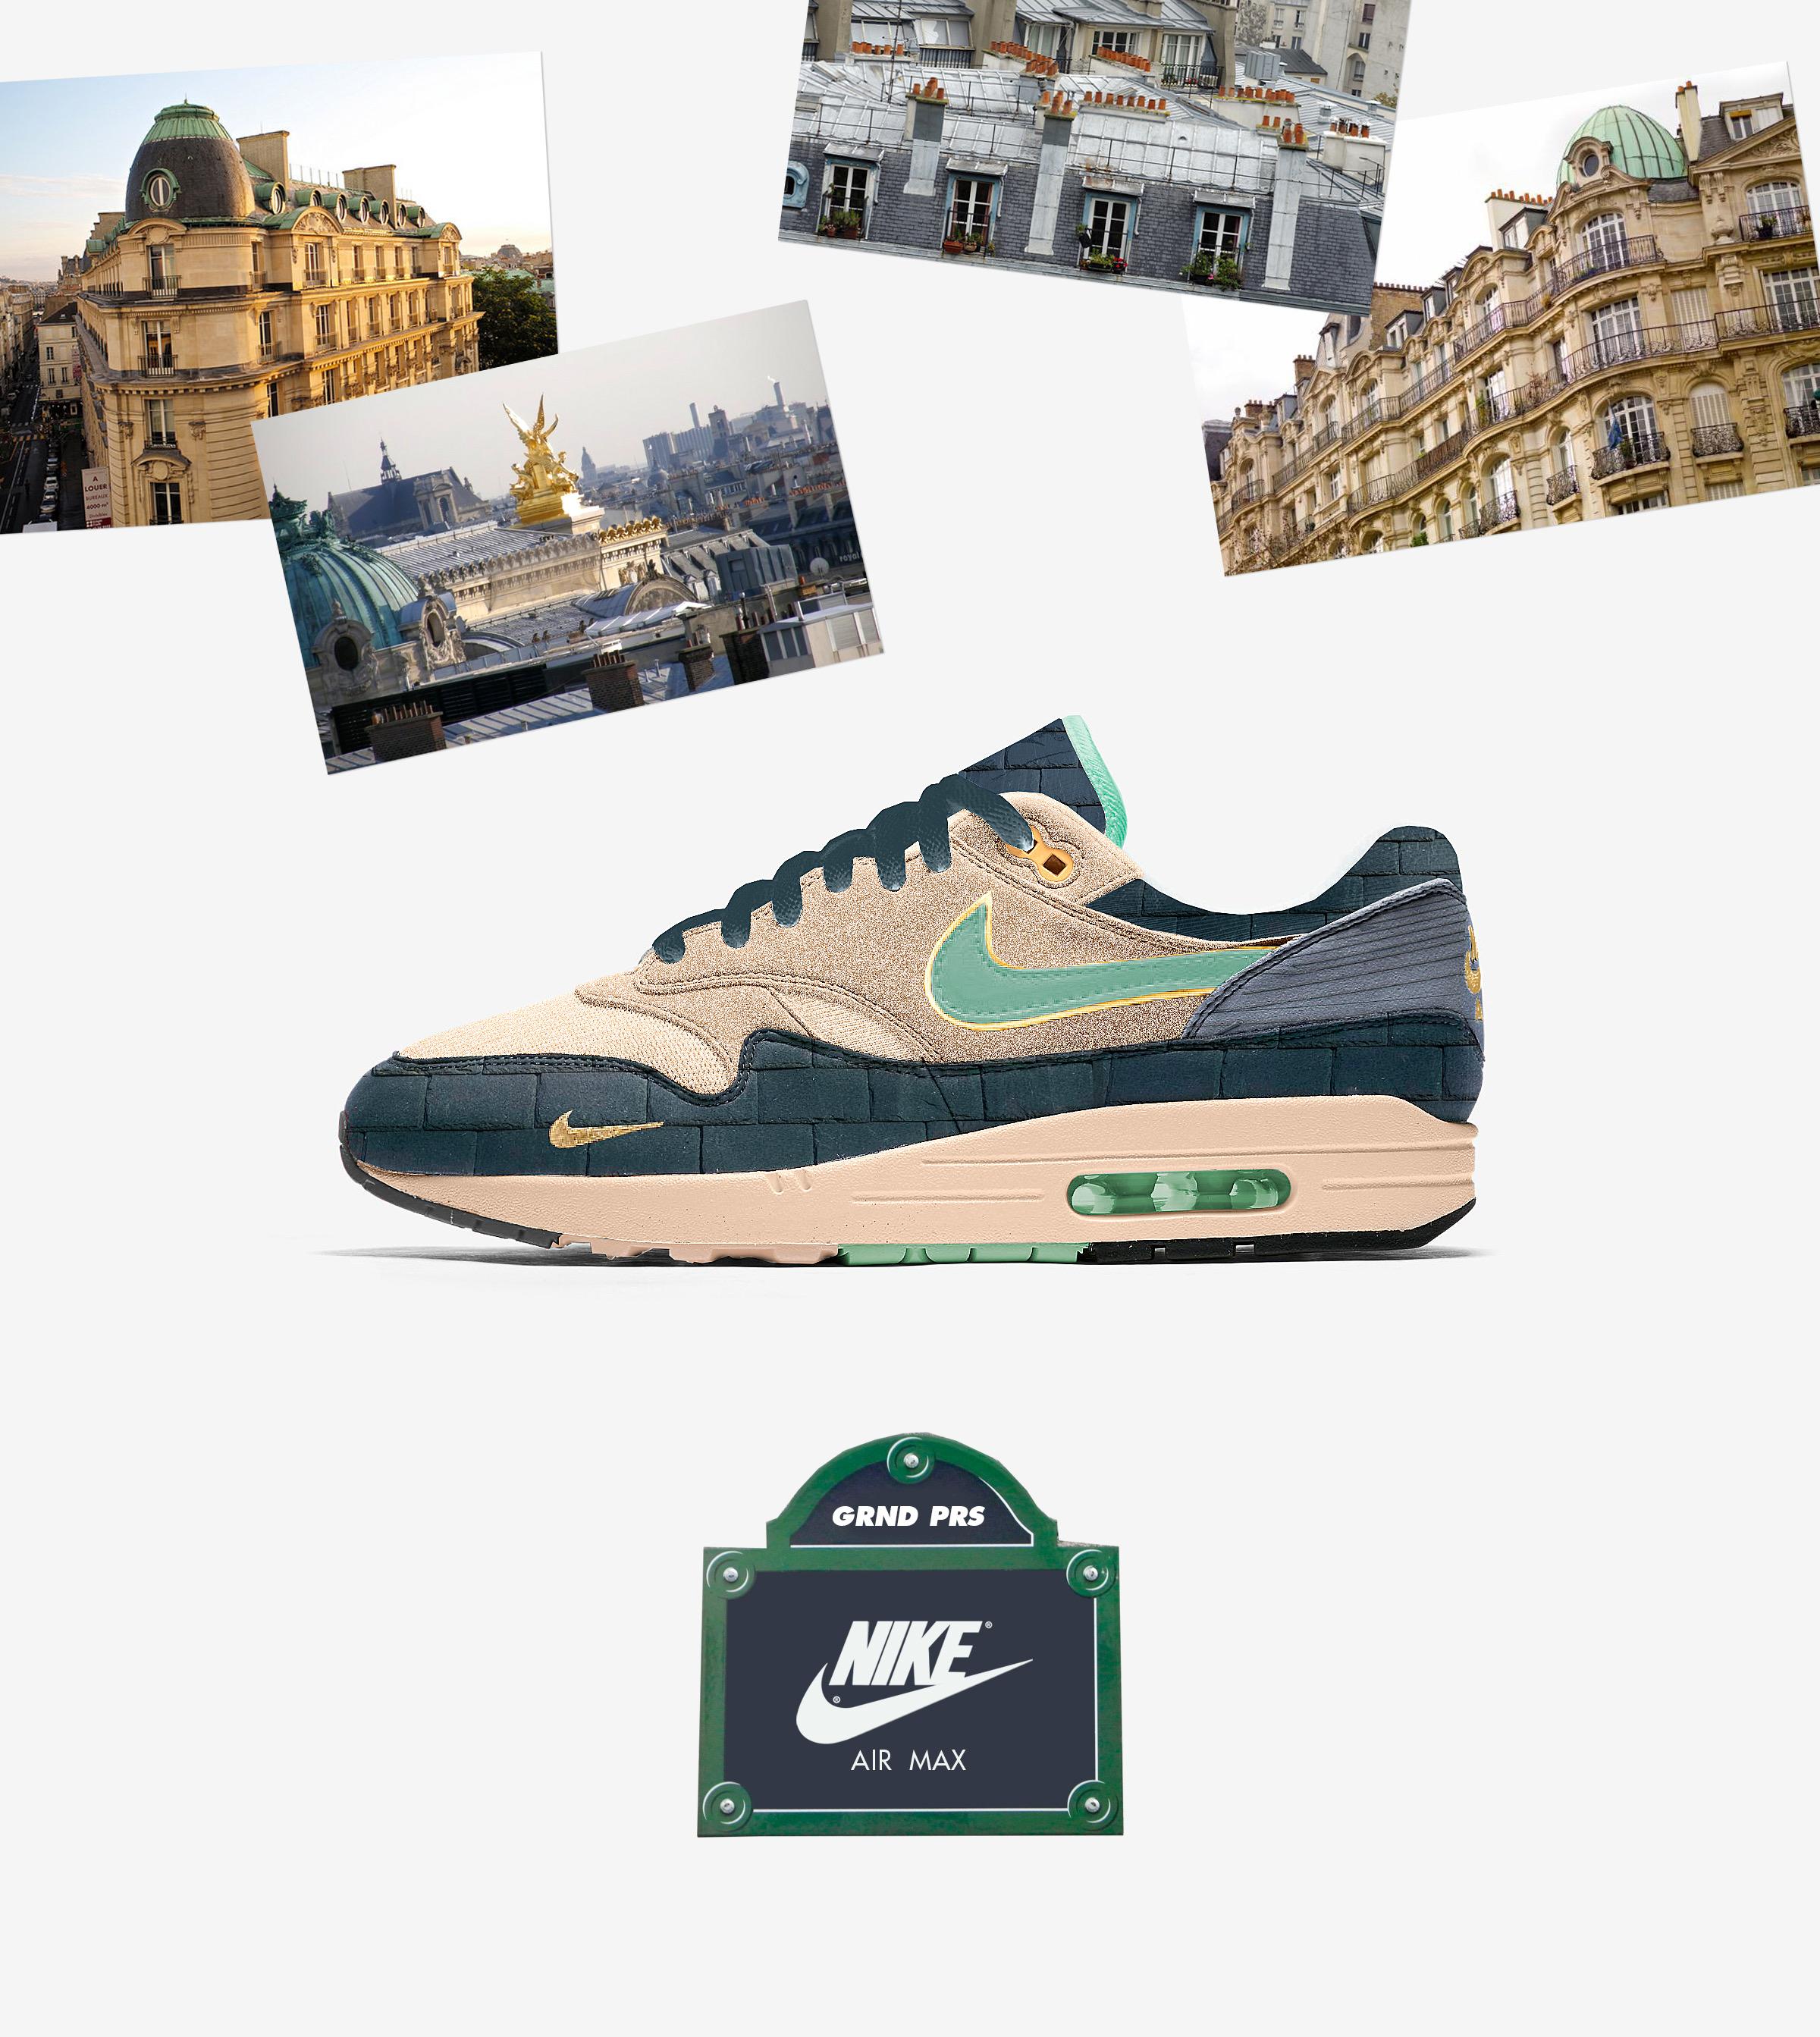 Nike-Air-Max-1-Grand-Paris-parisONAIR-2019-001.jpg